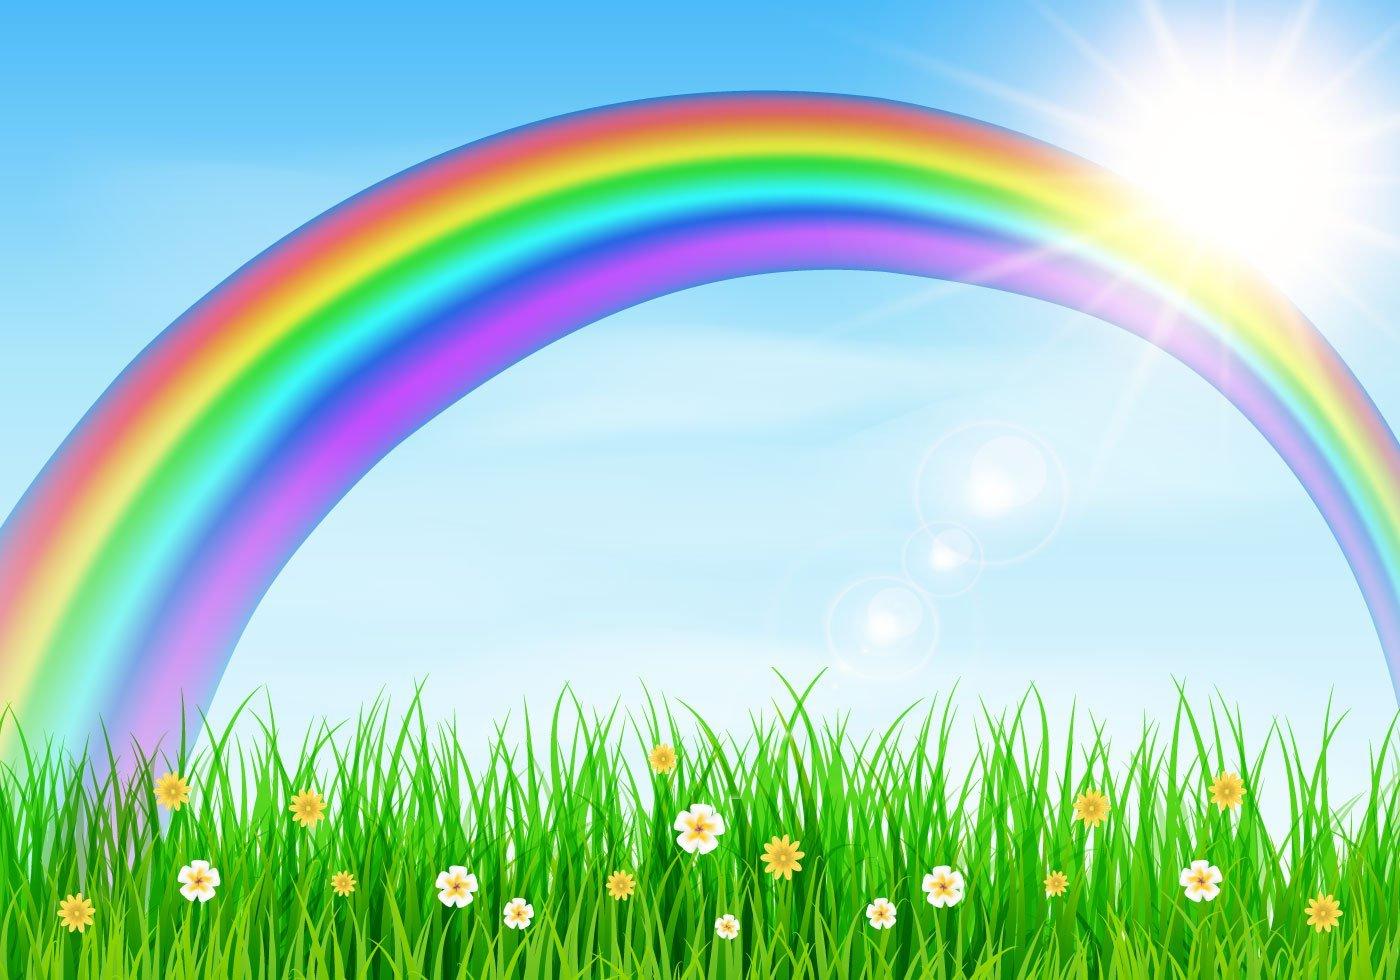 Rainbow background clipart 8 » Clipart Portal.